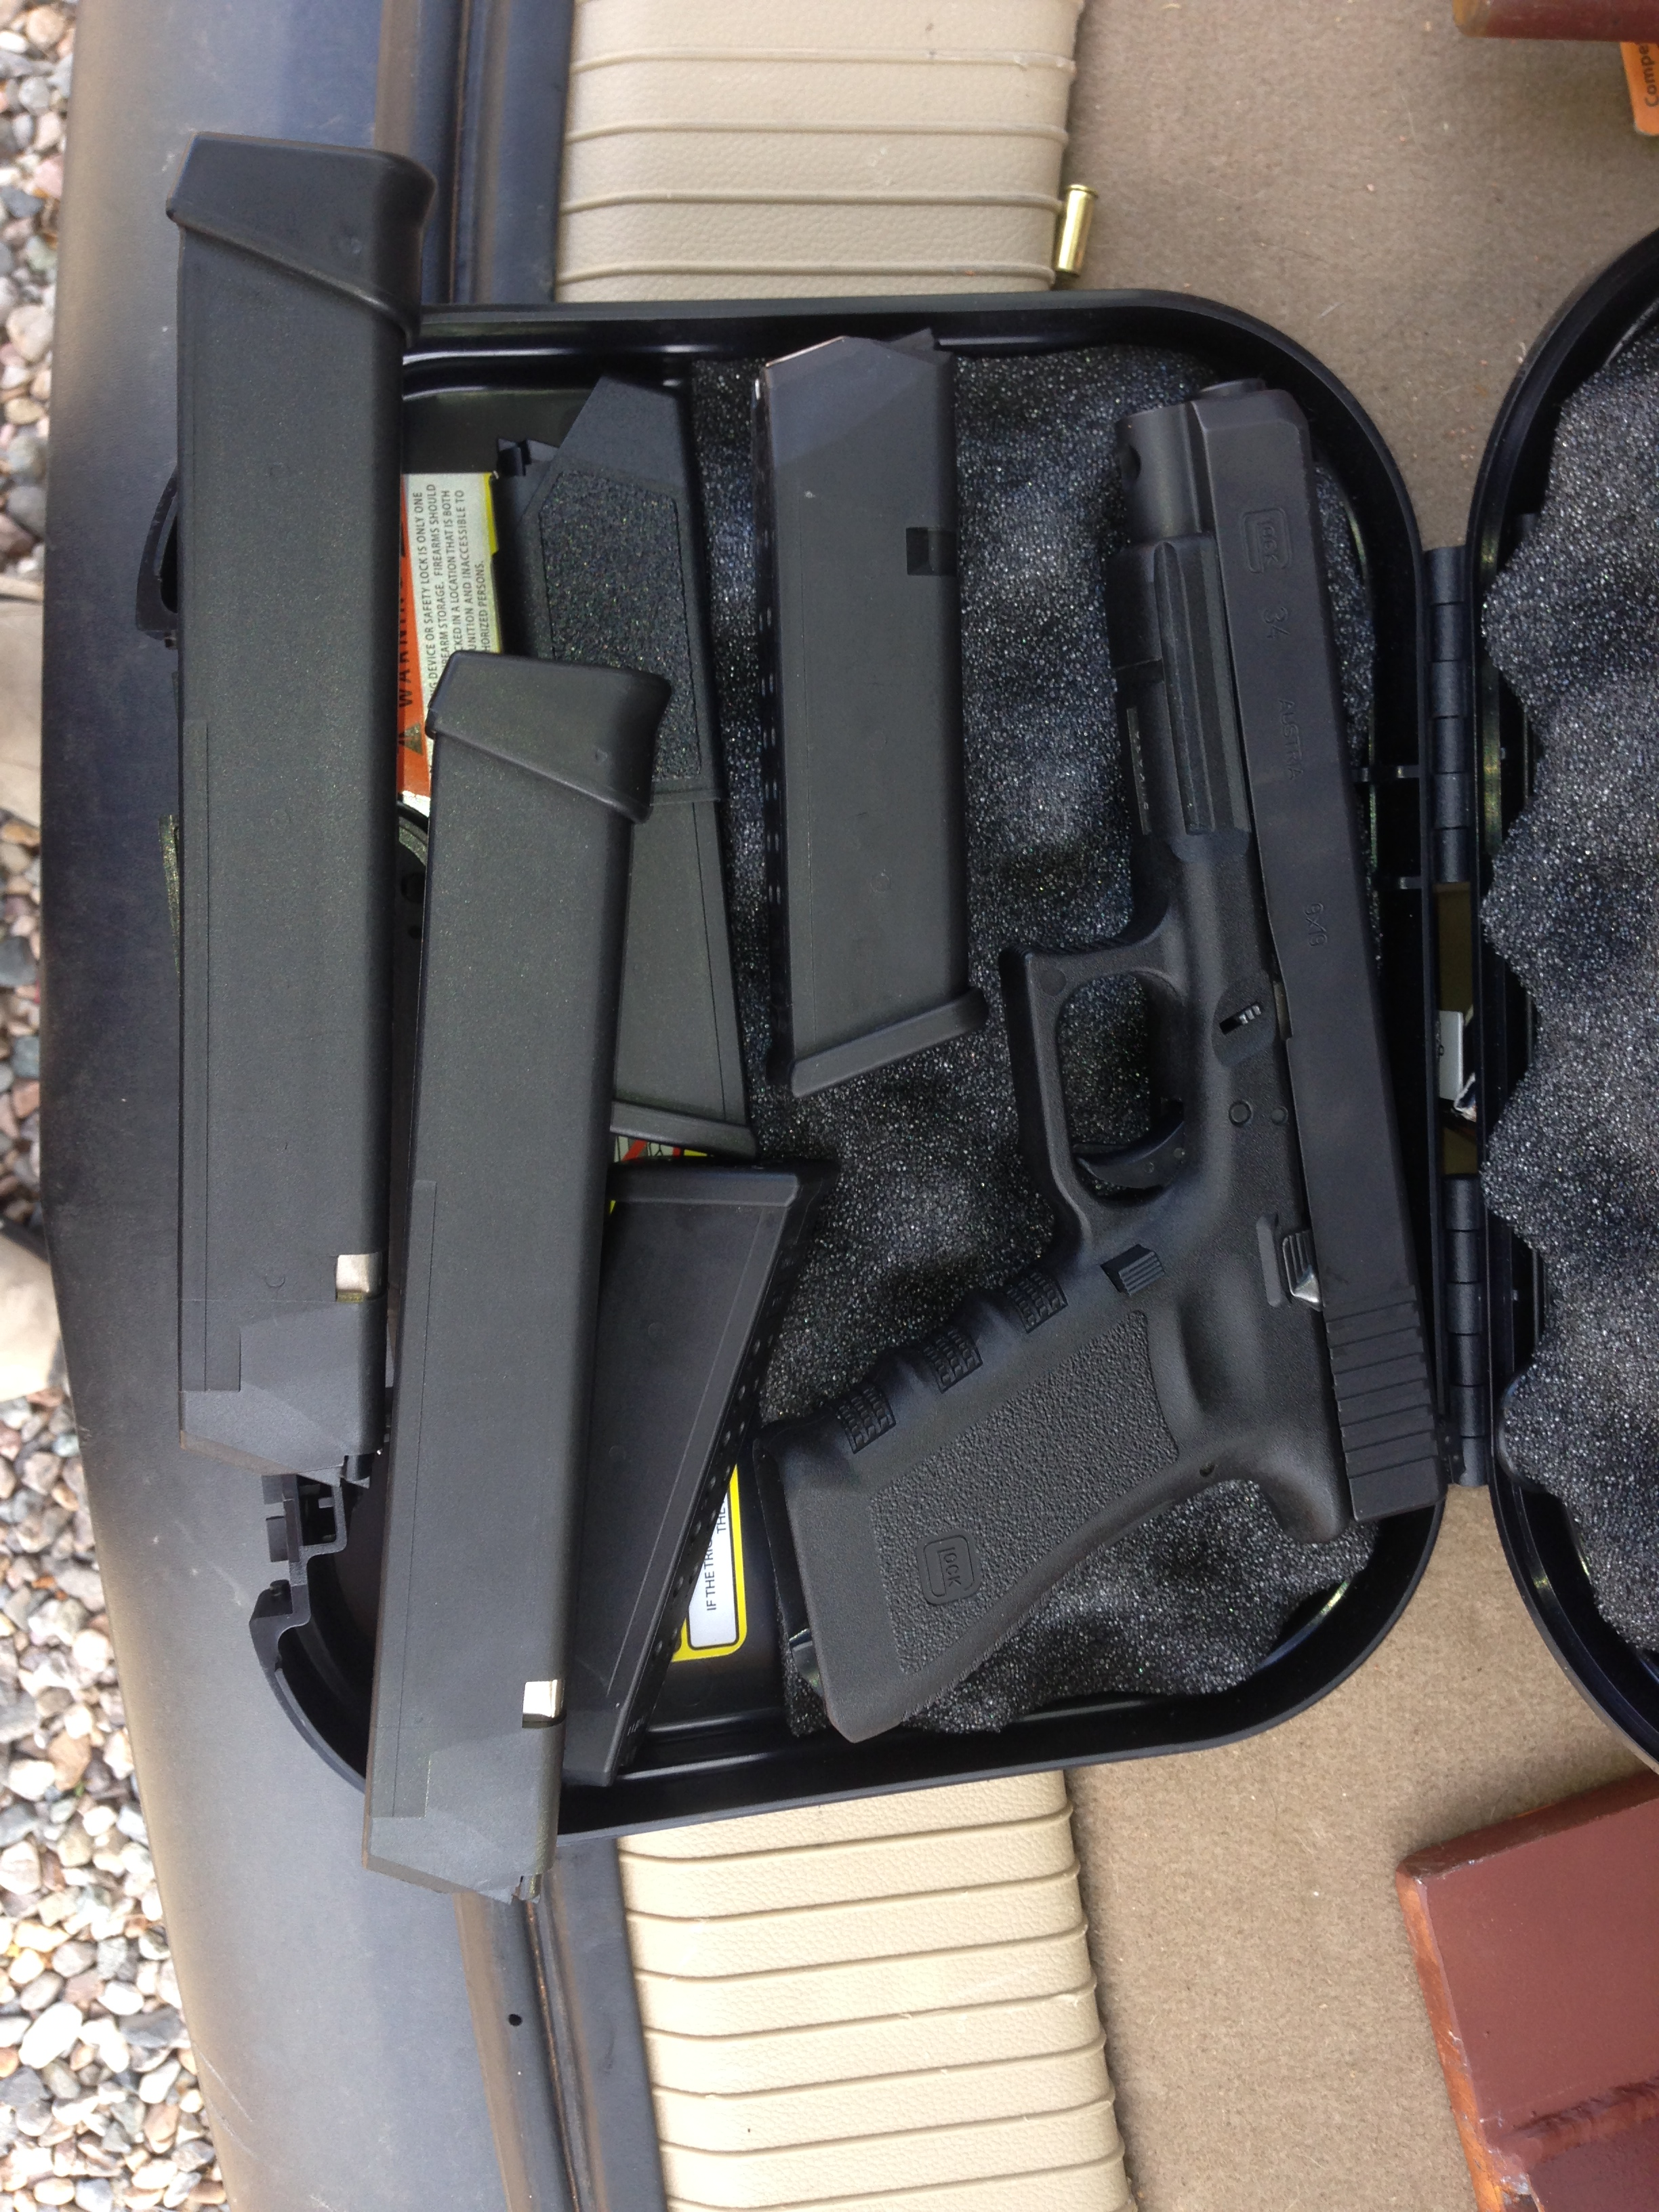 glock 34 7 mags-4e94ac6f-bd75-441d-87bf-ed46ddde1754_zpsfagb1uox.jpg